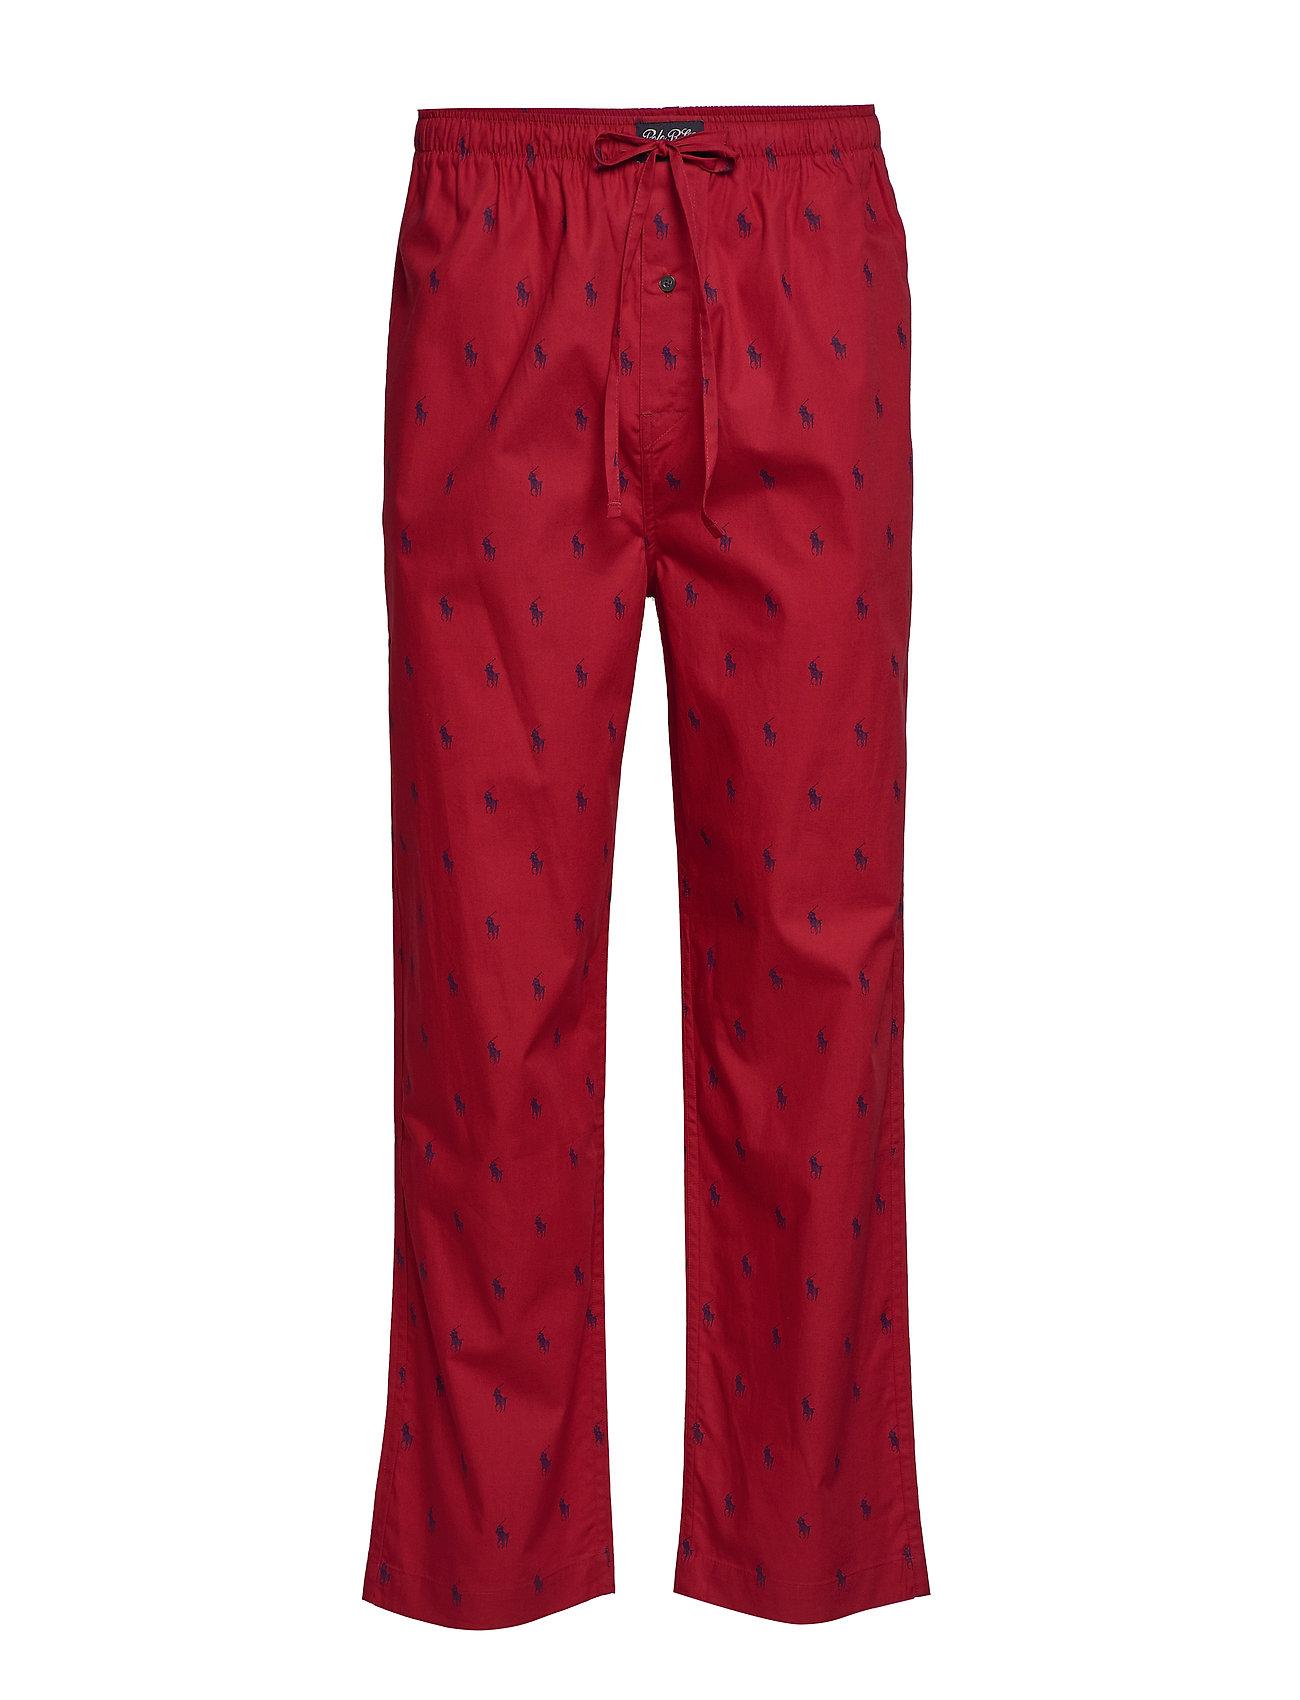 Polo Ralph Lauren Underwear Cotton Sleep Pant - EATON RED AOPP CR